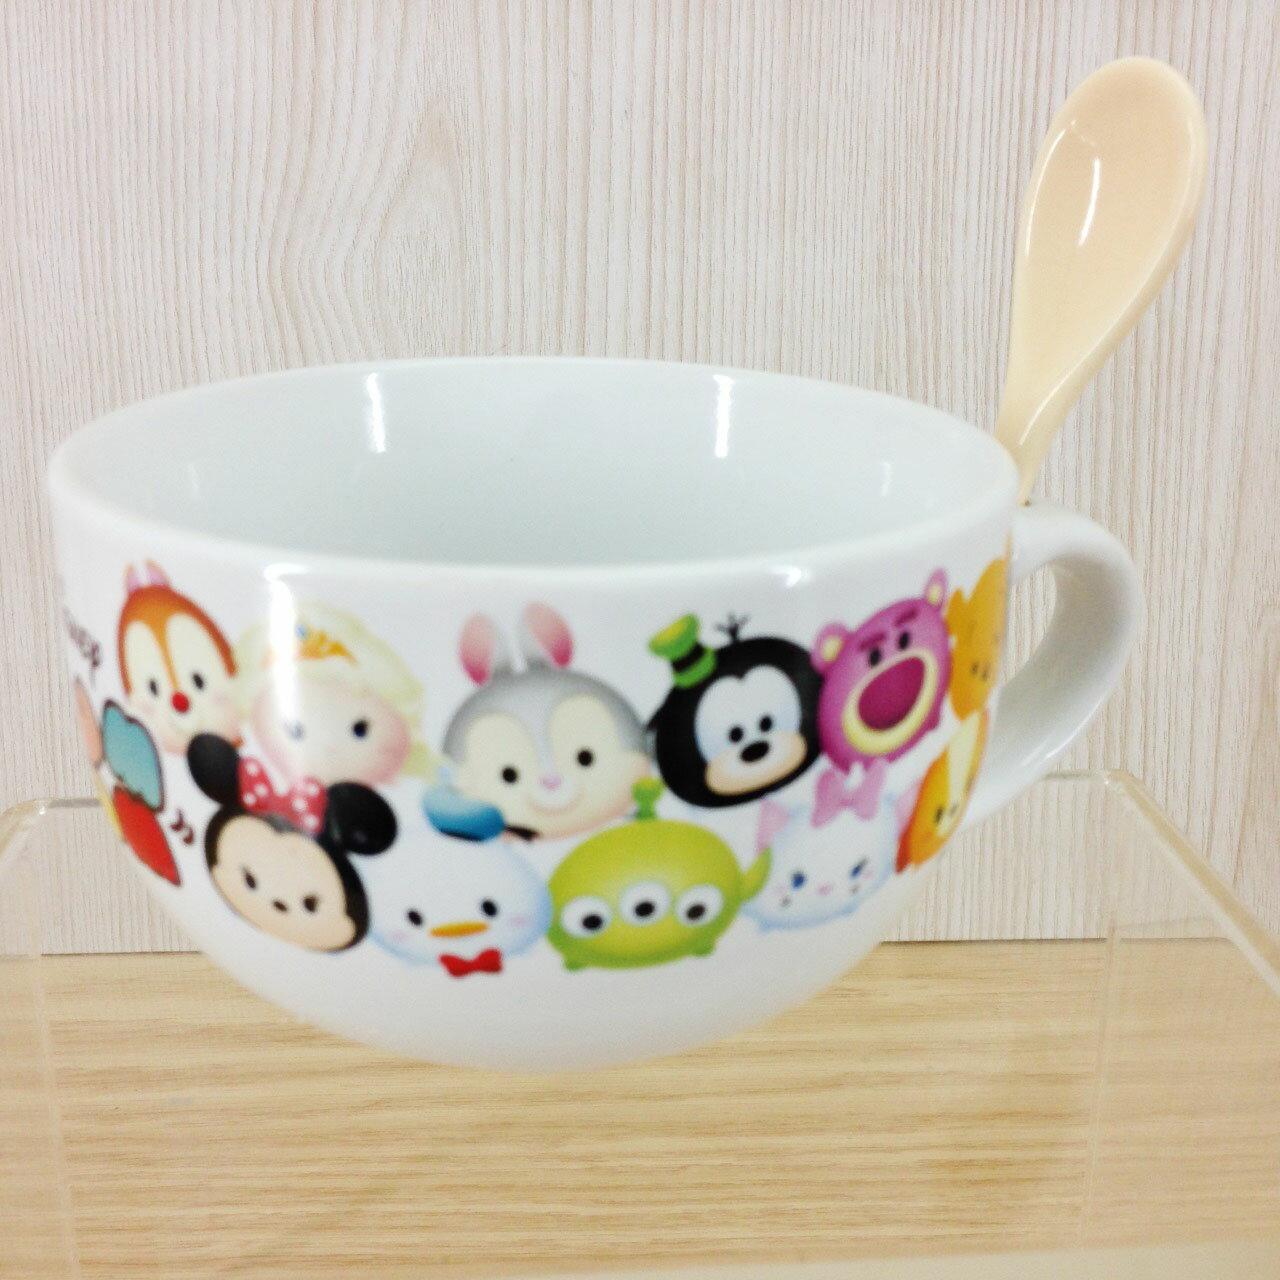 【真愛日本】 16010500002 陶瓷湯杯附匙-TSUM排排 Disney TsumTsum 米奇 杯子 馬克杯